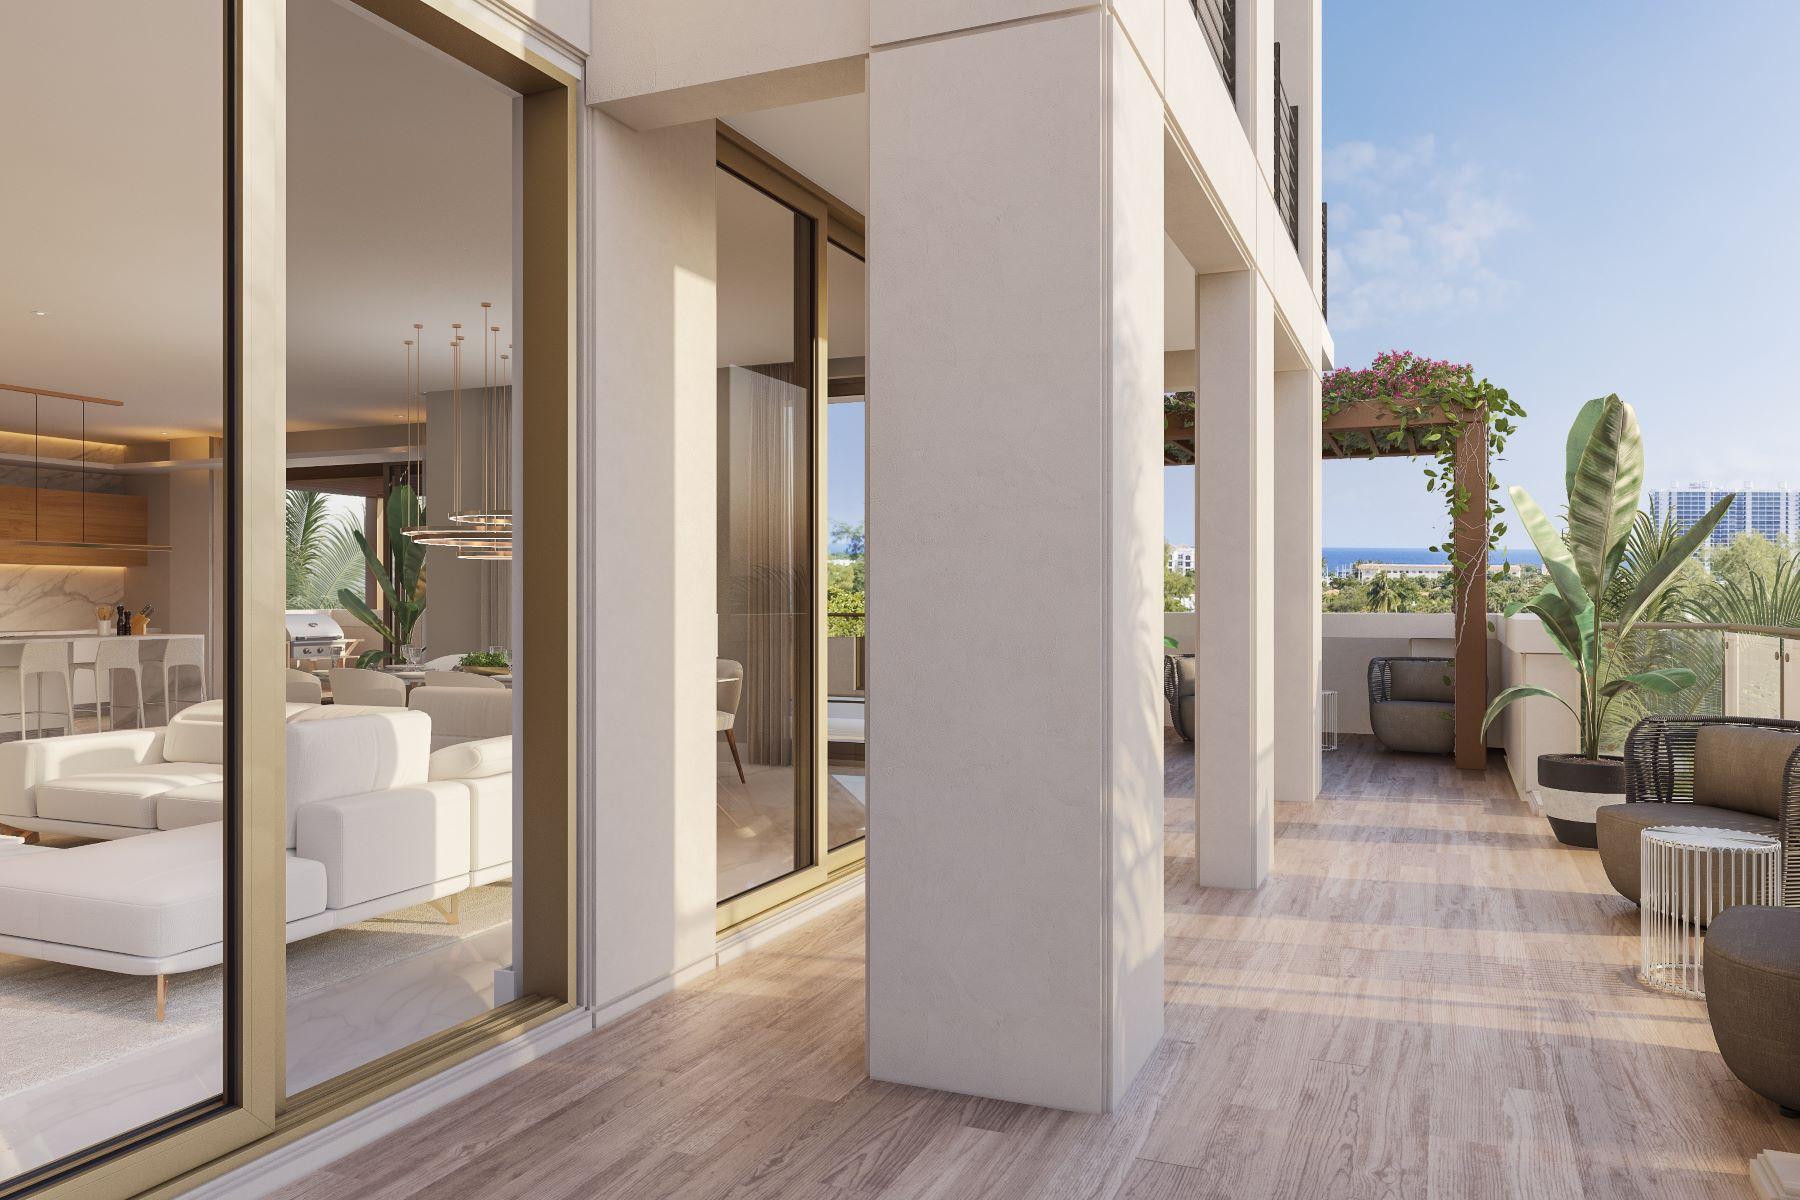 Condominiums for Active at 475 E Royal Palm Rd 803 Boca Raton, Florida 33432 United States